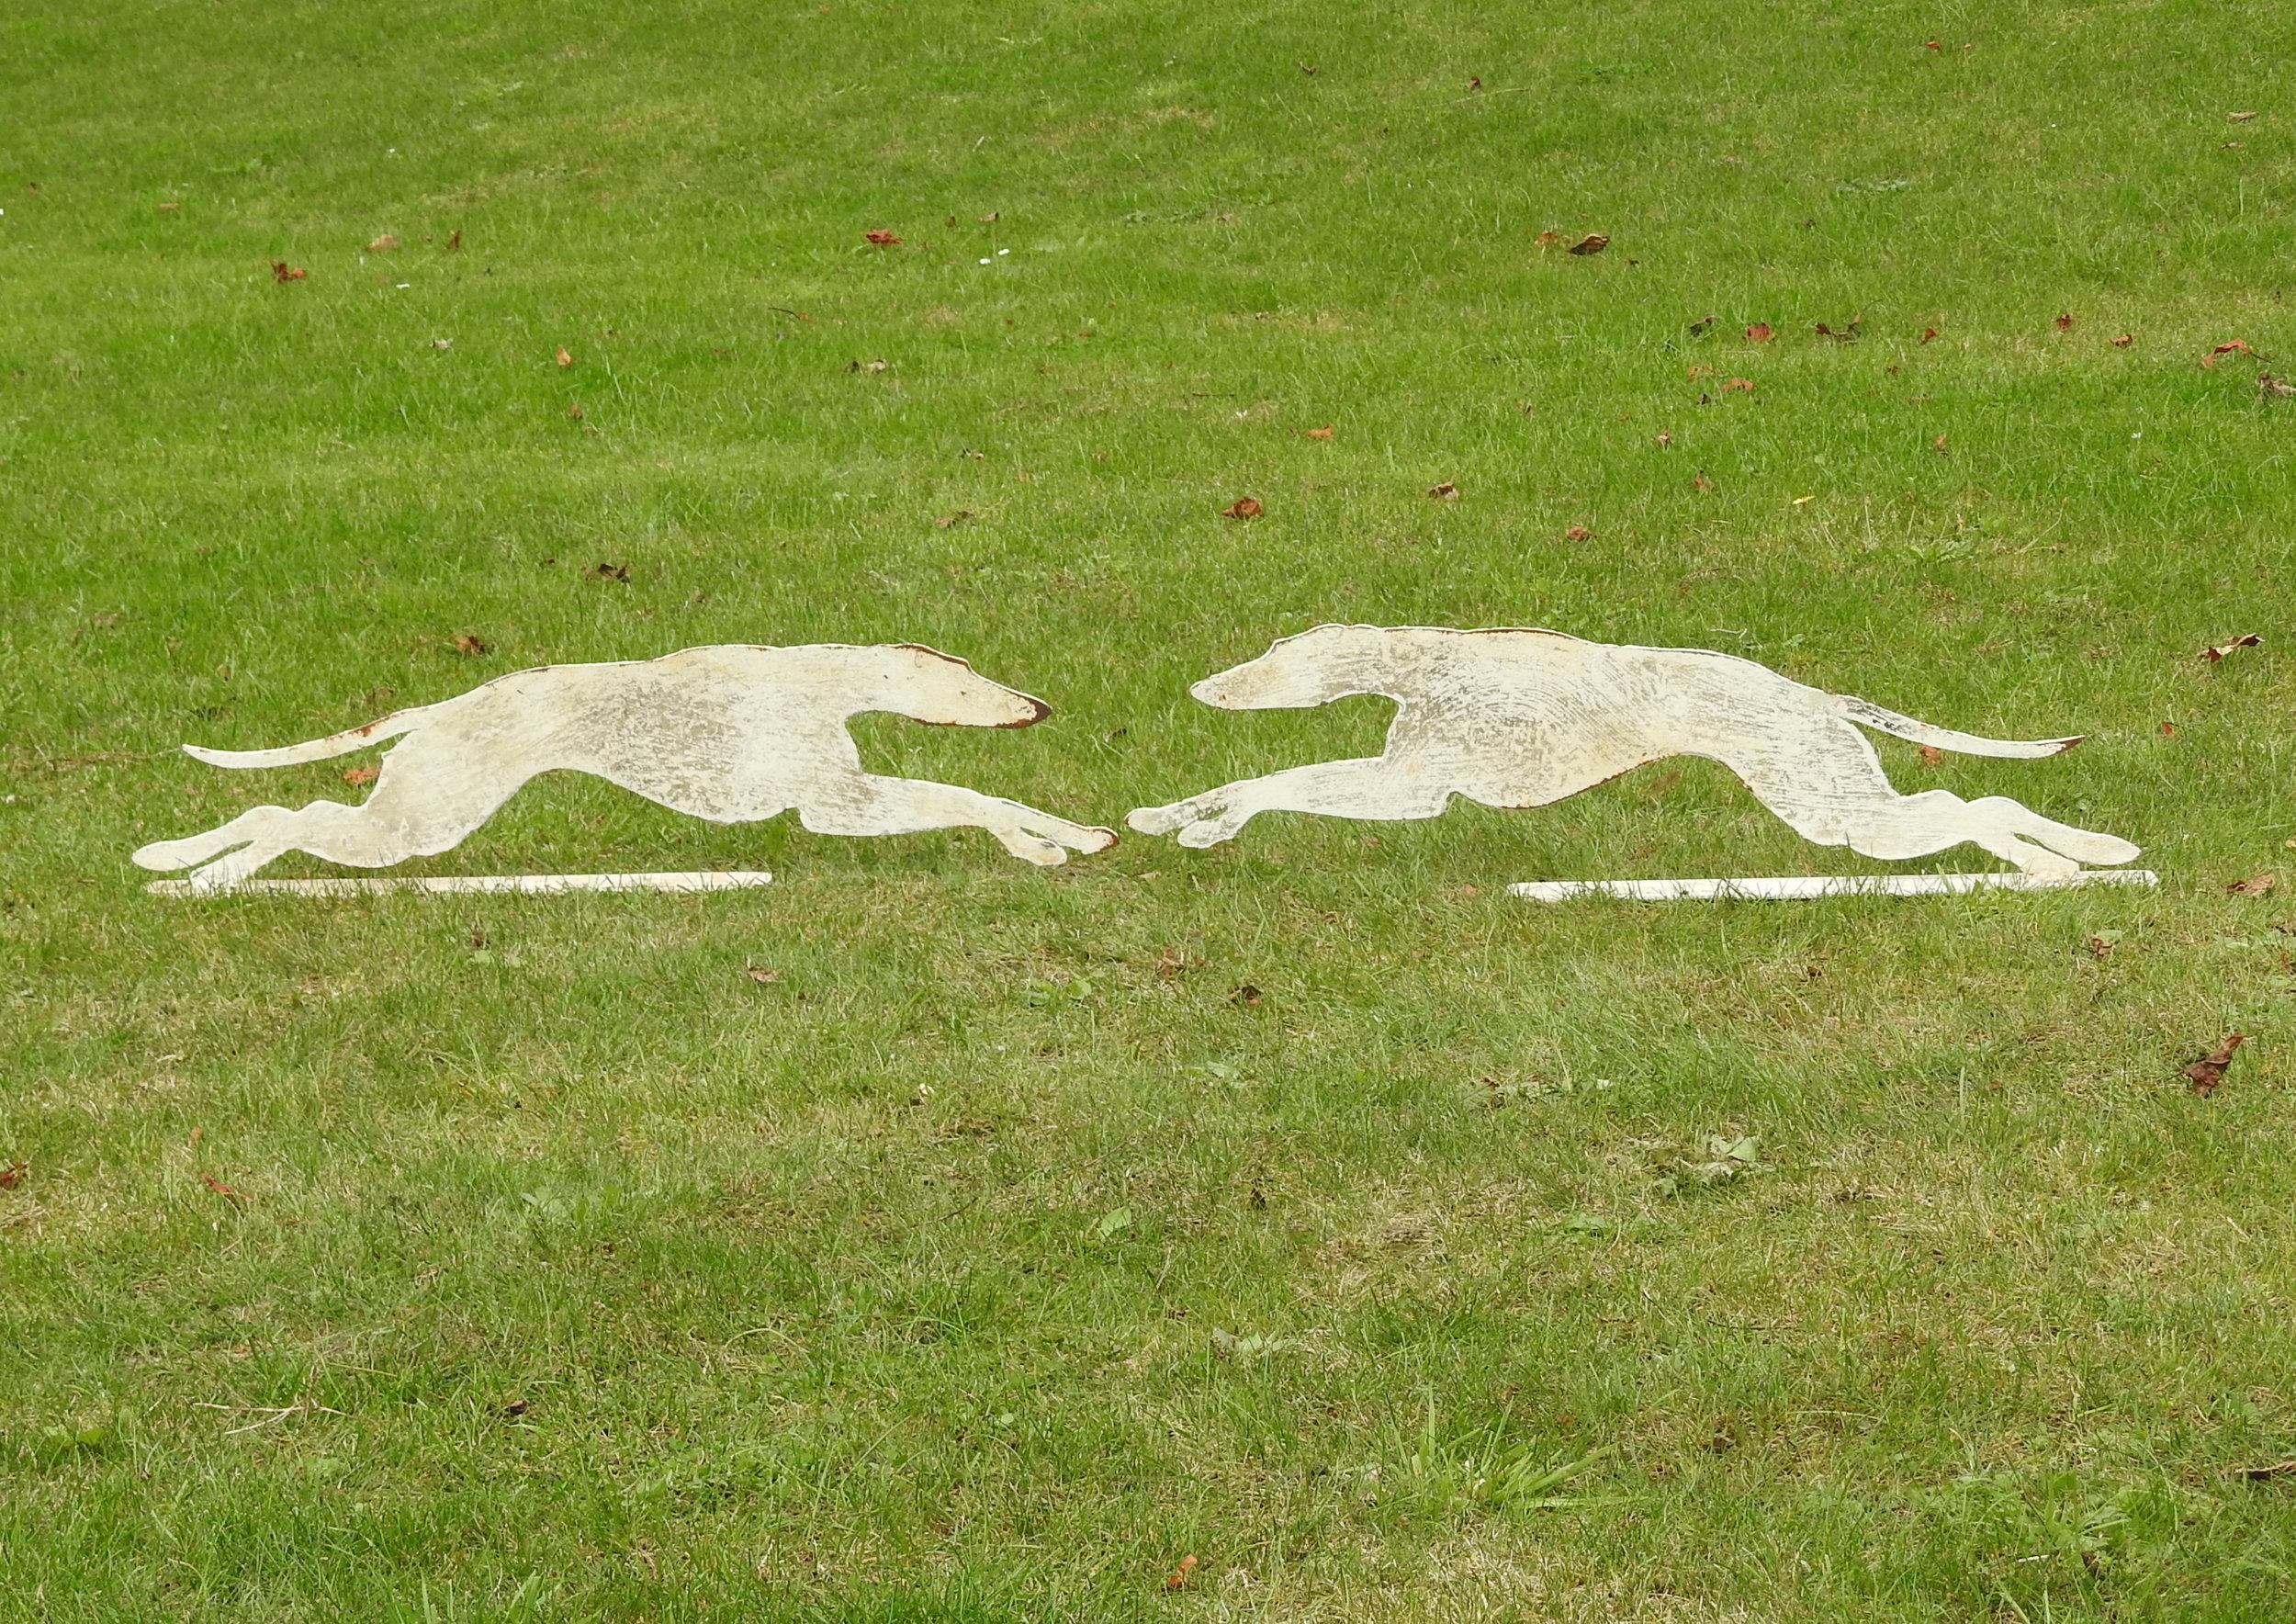 Running Whippets -£210 &£140pr - Large: 24 x 75cmSmall: 15 x 50cm